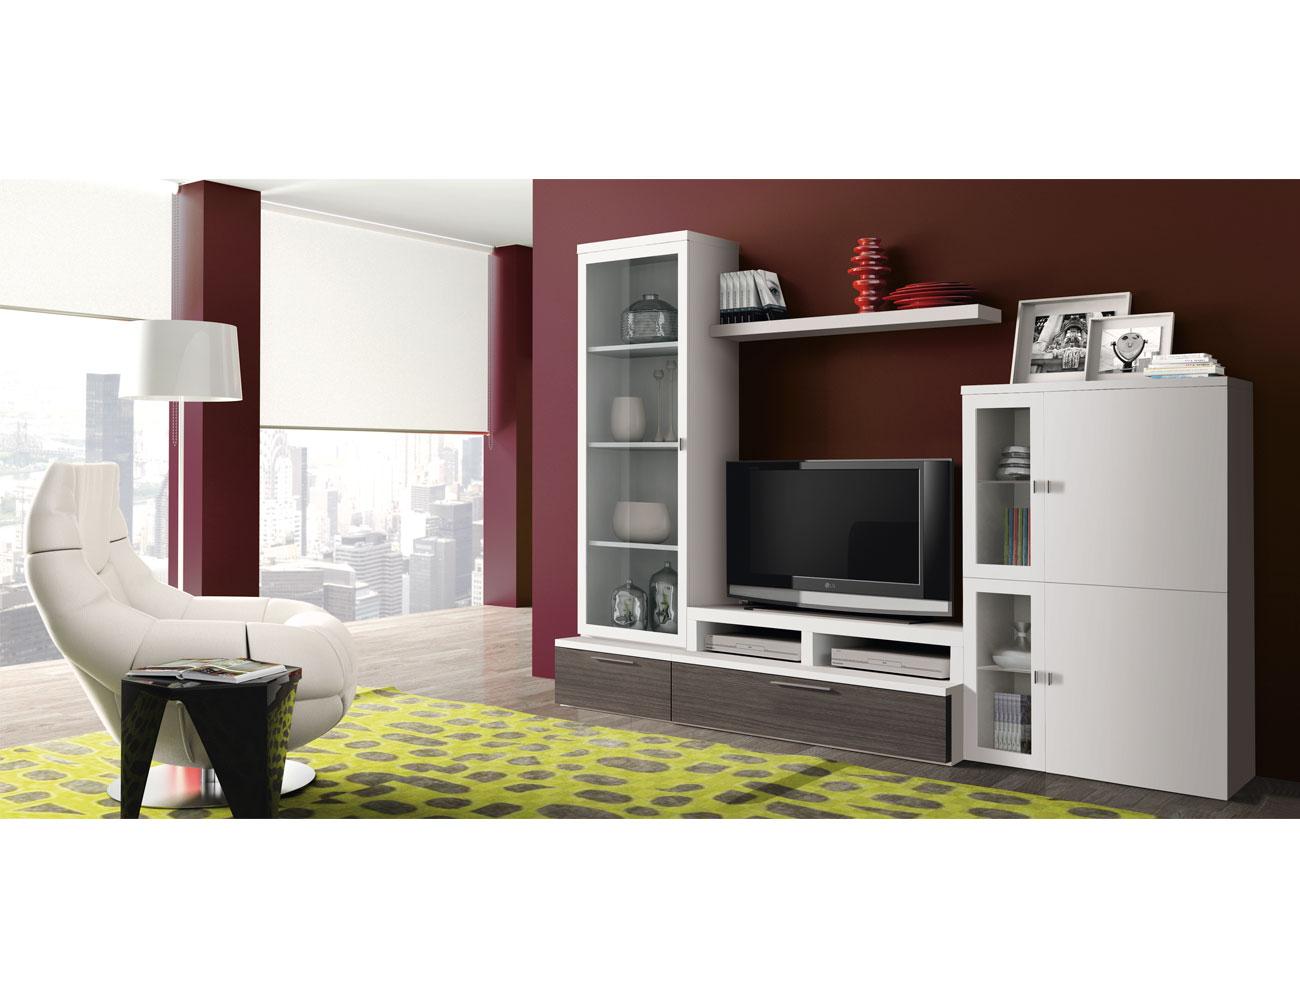 718 mueble salon comedor paisaje